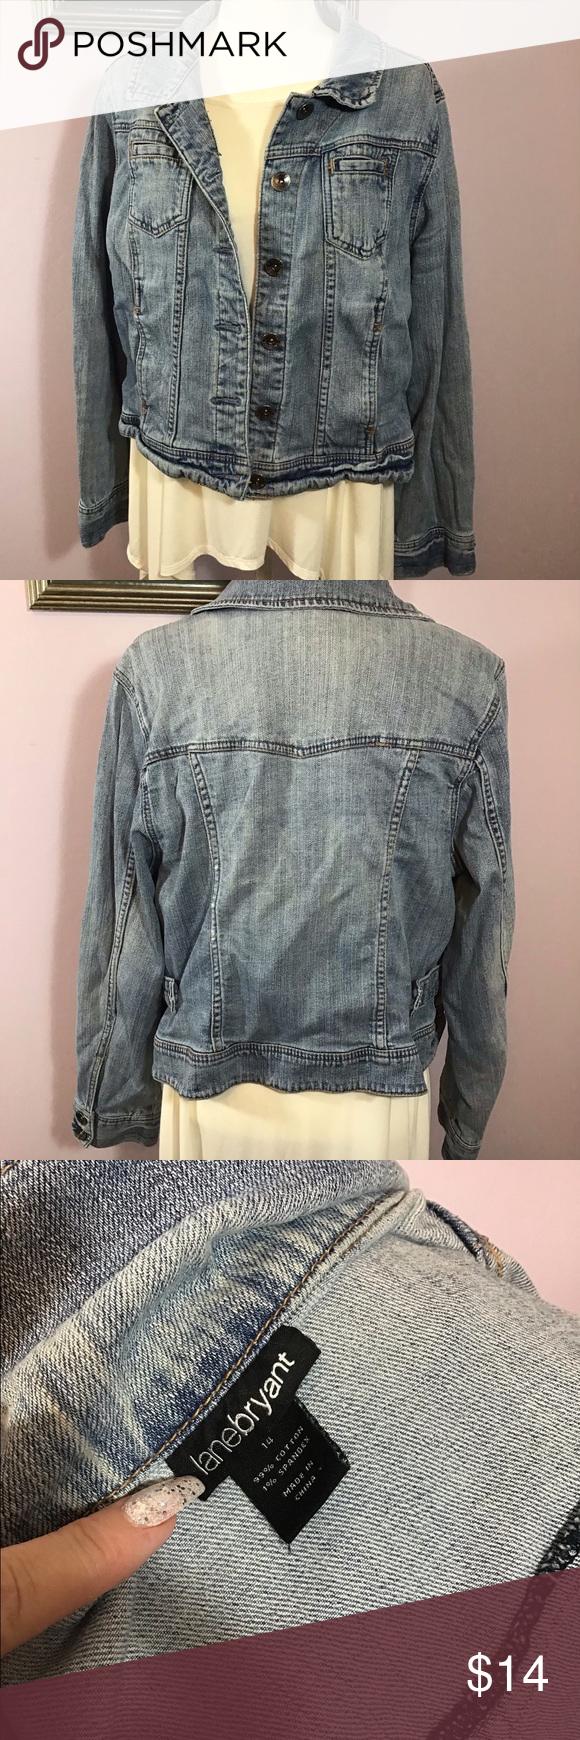 Lane Bryant Denim Jacket Size 14 Clothes Design Cute Jean Jackets Fashion [ 1740 x 580 Pixel ]